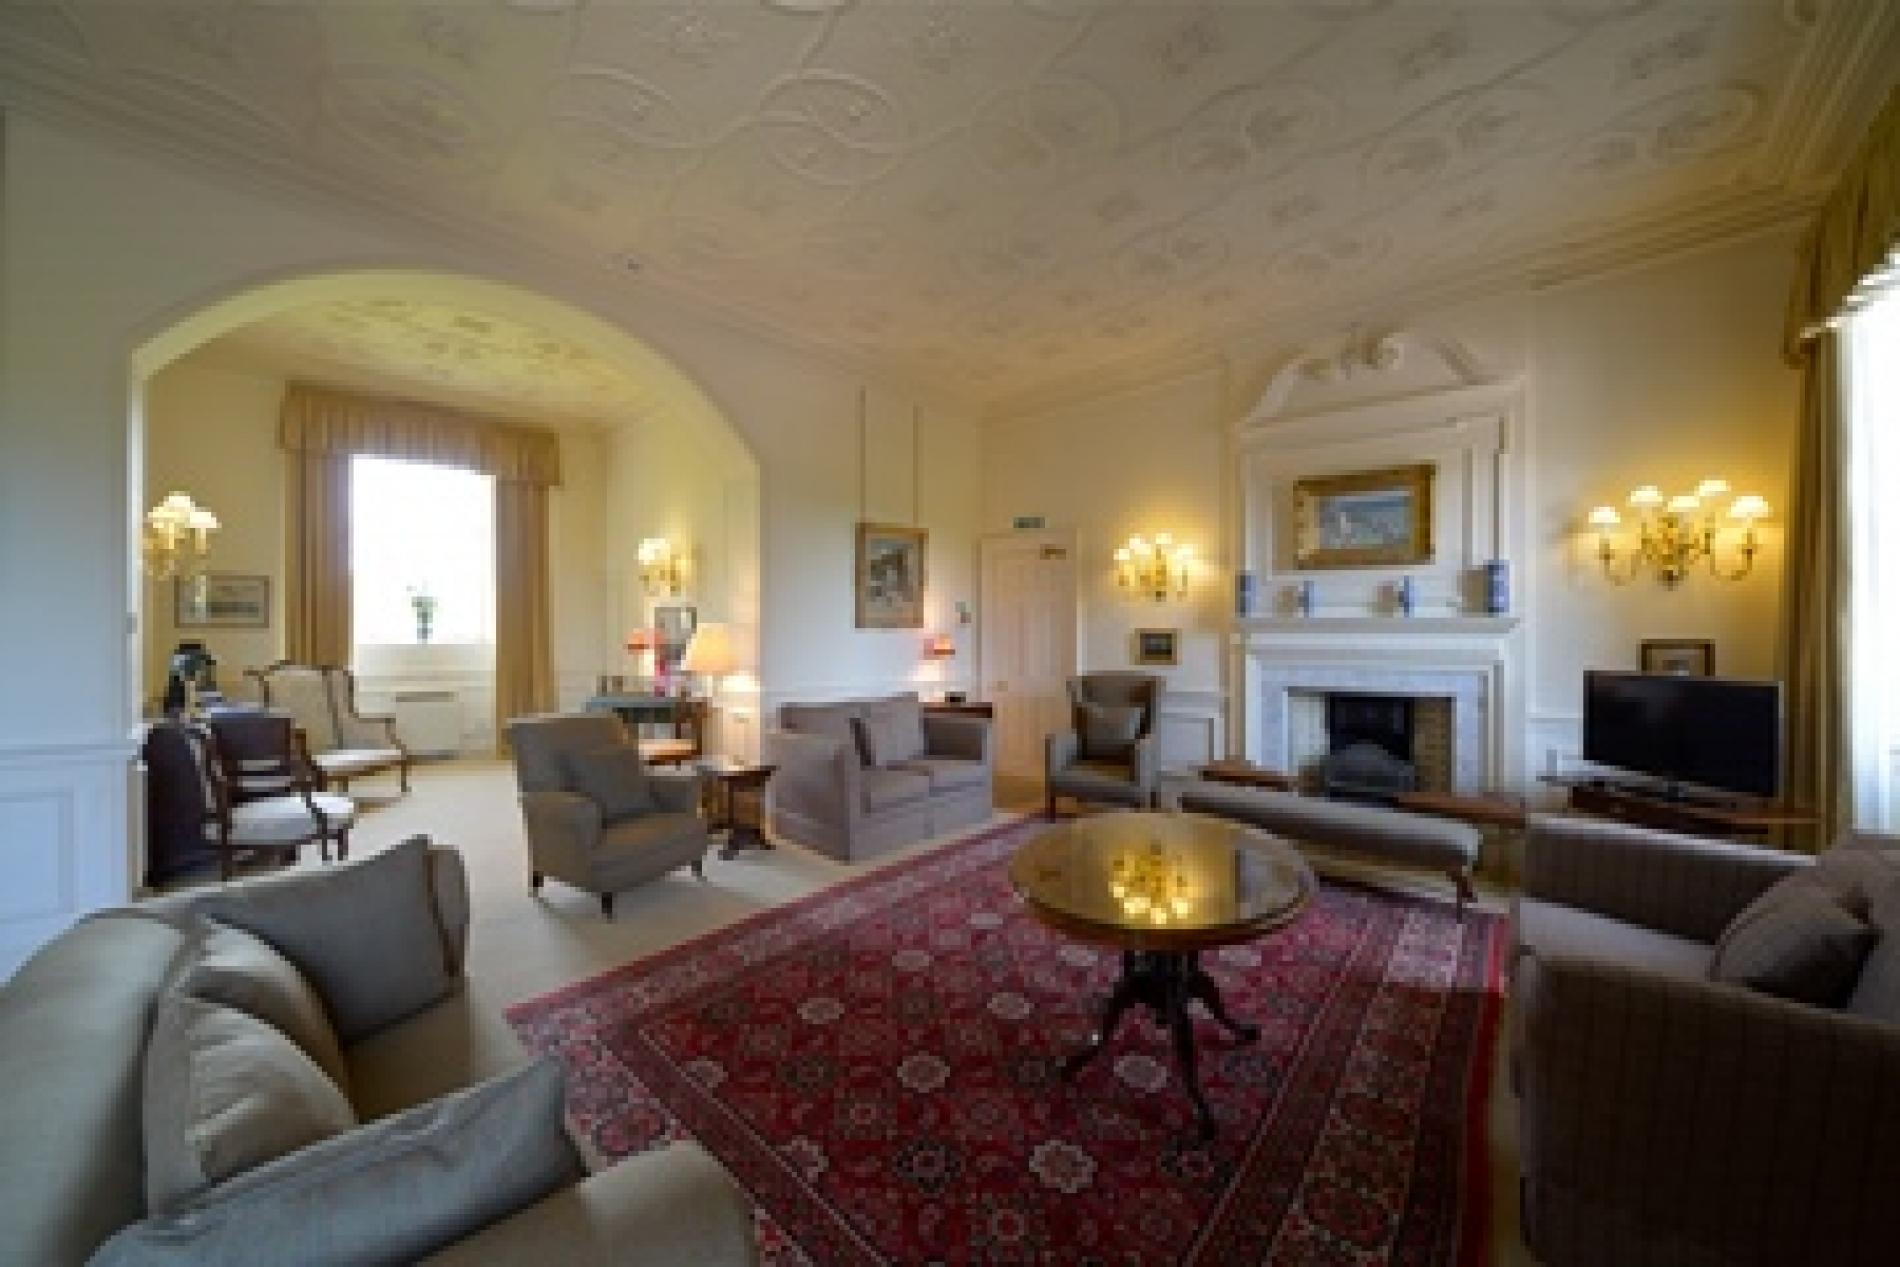 Fyvie Castle Garden & Estate Visitor Information